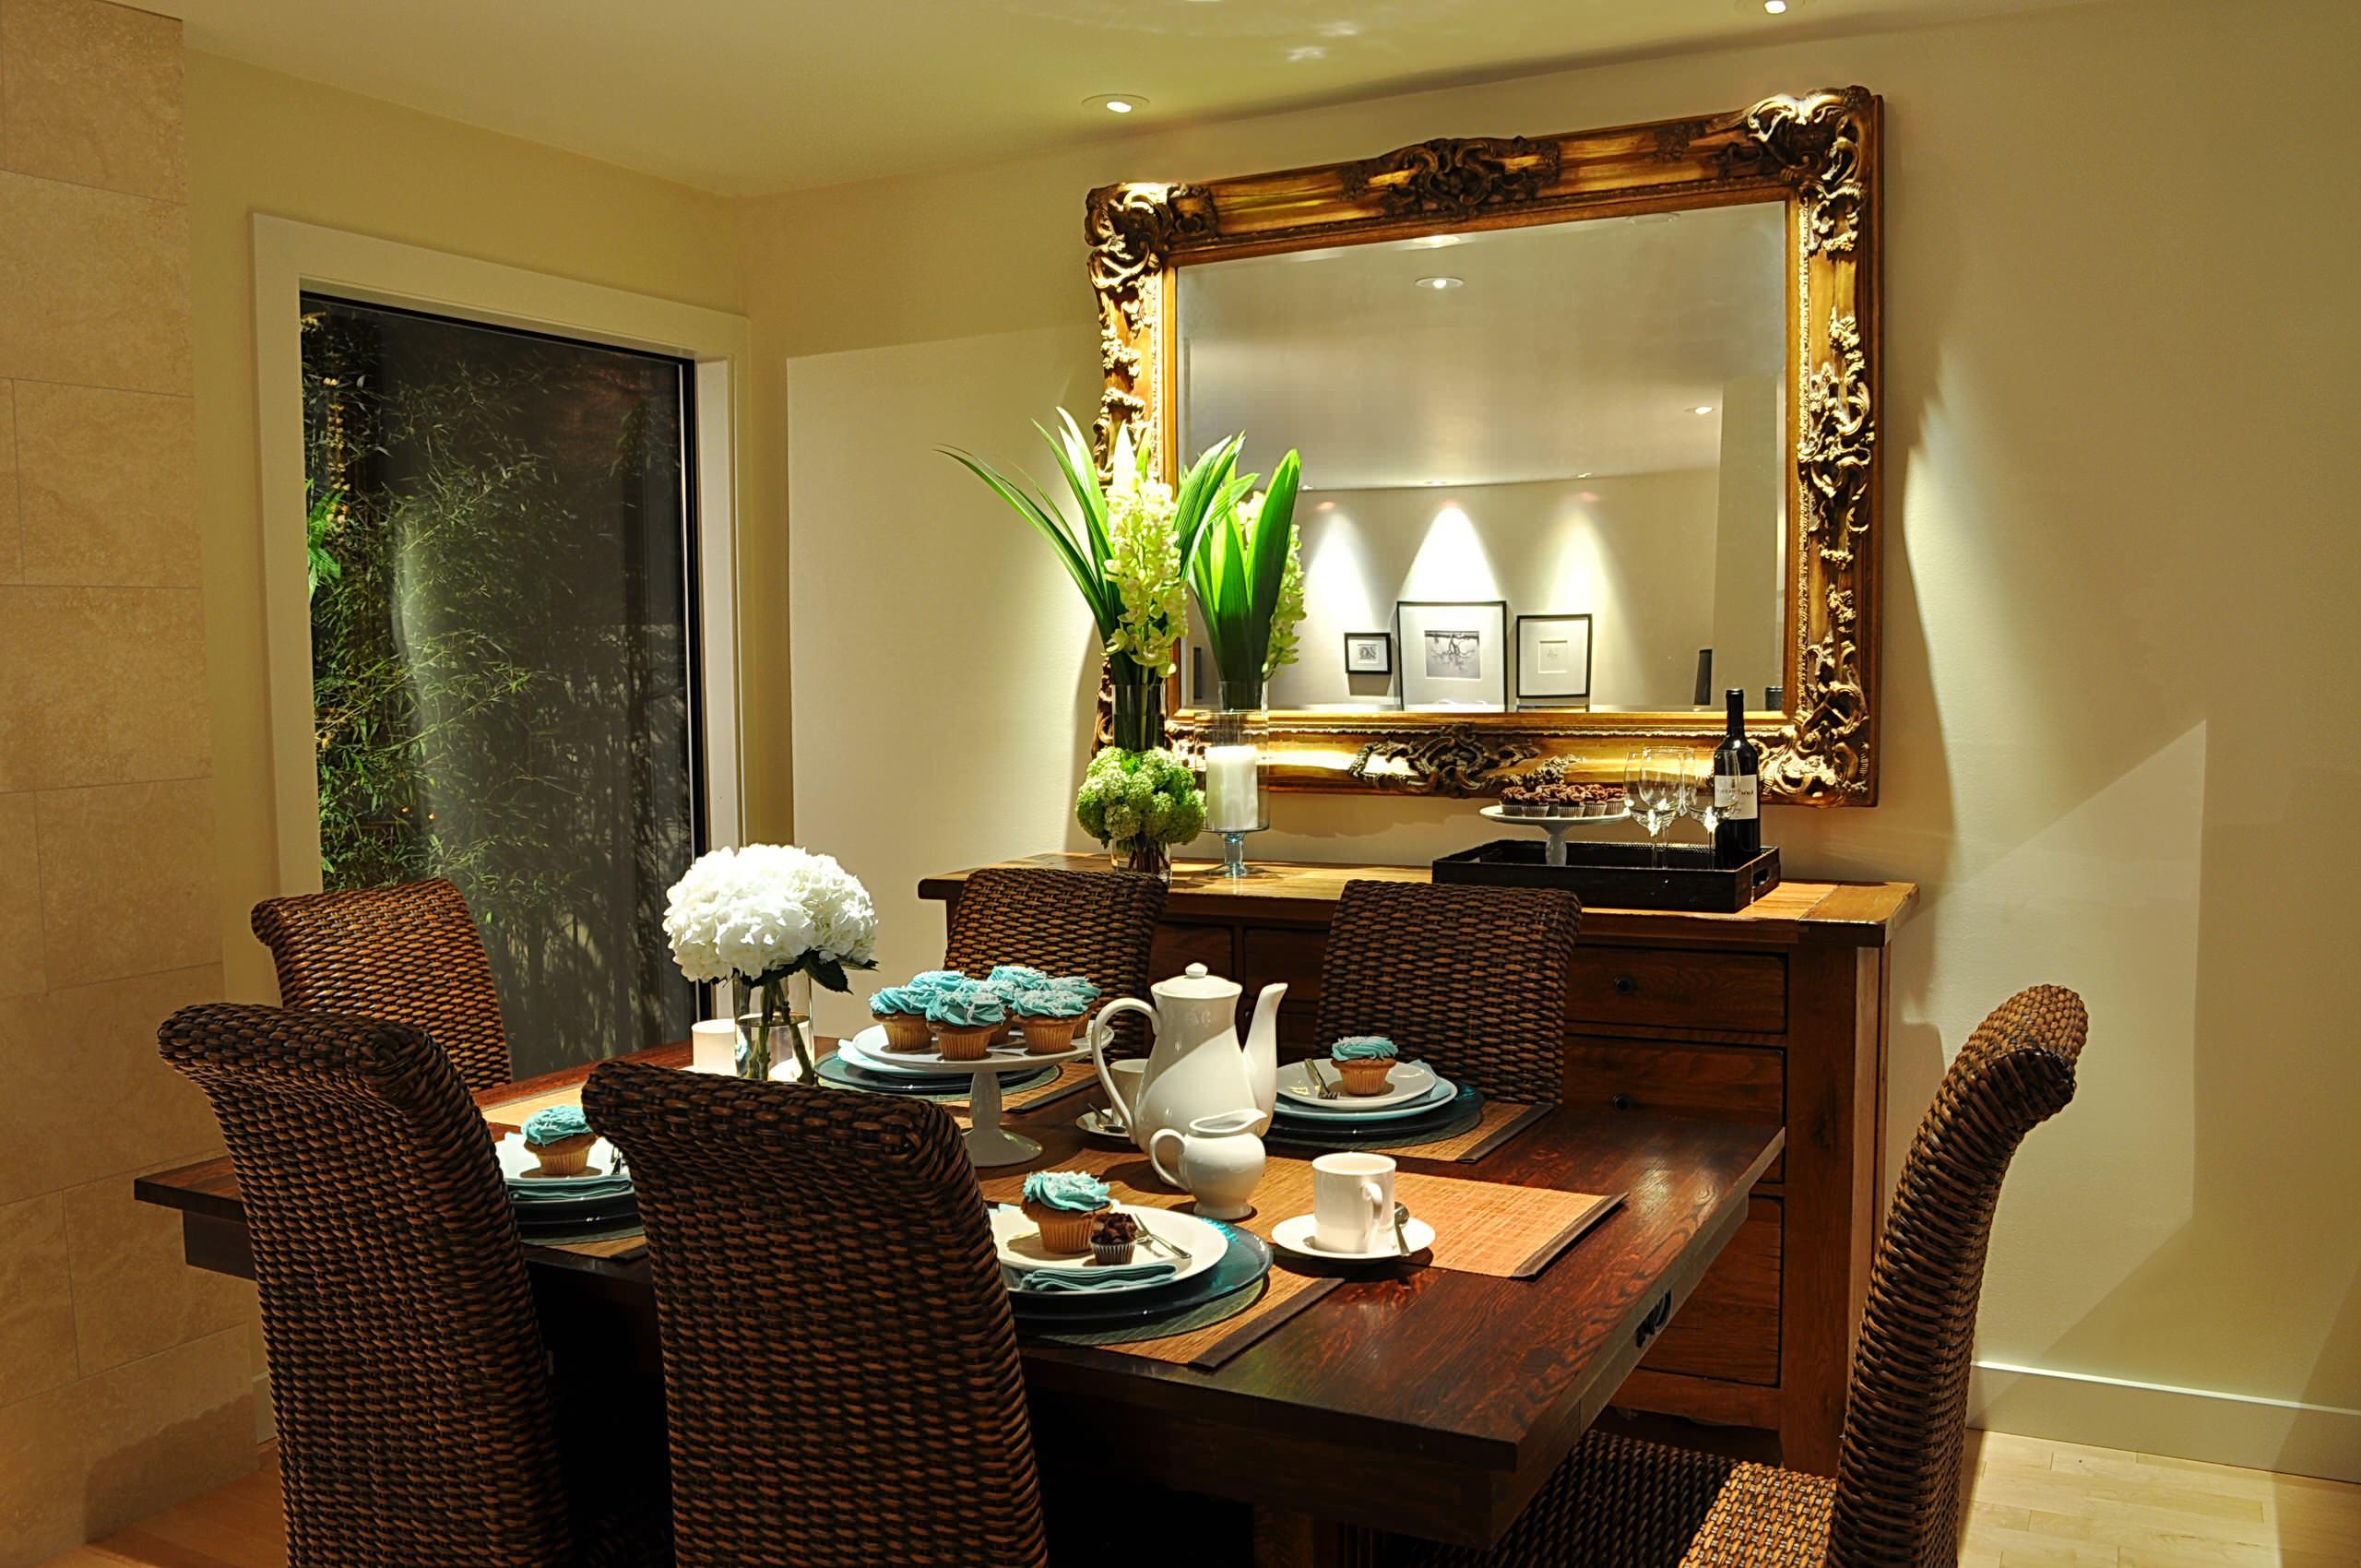 Raveninside Interior Design